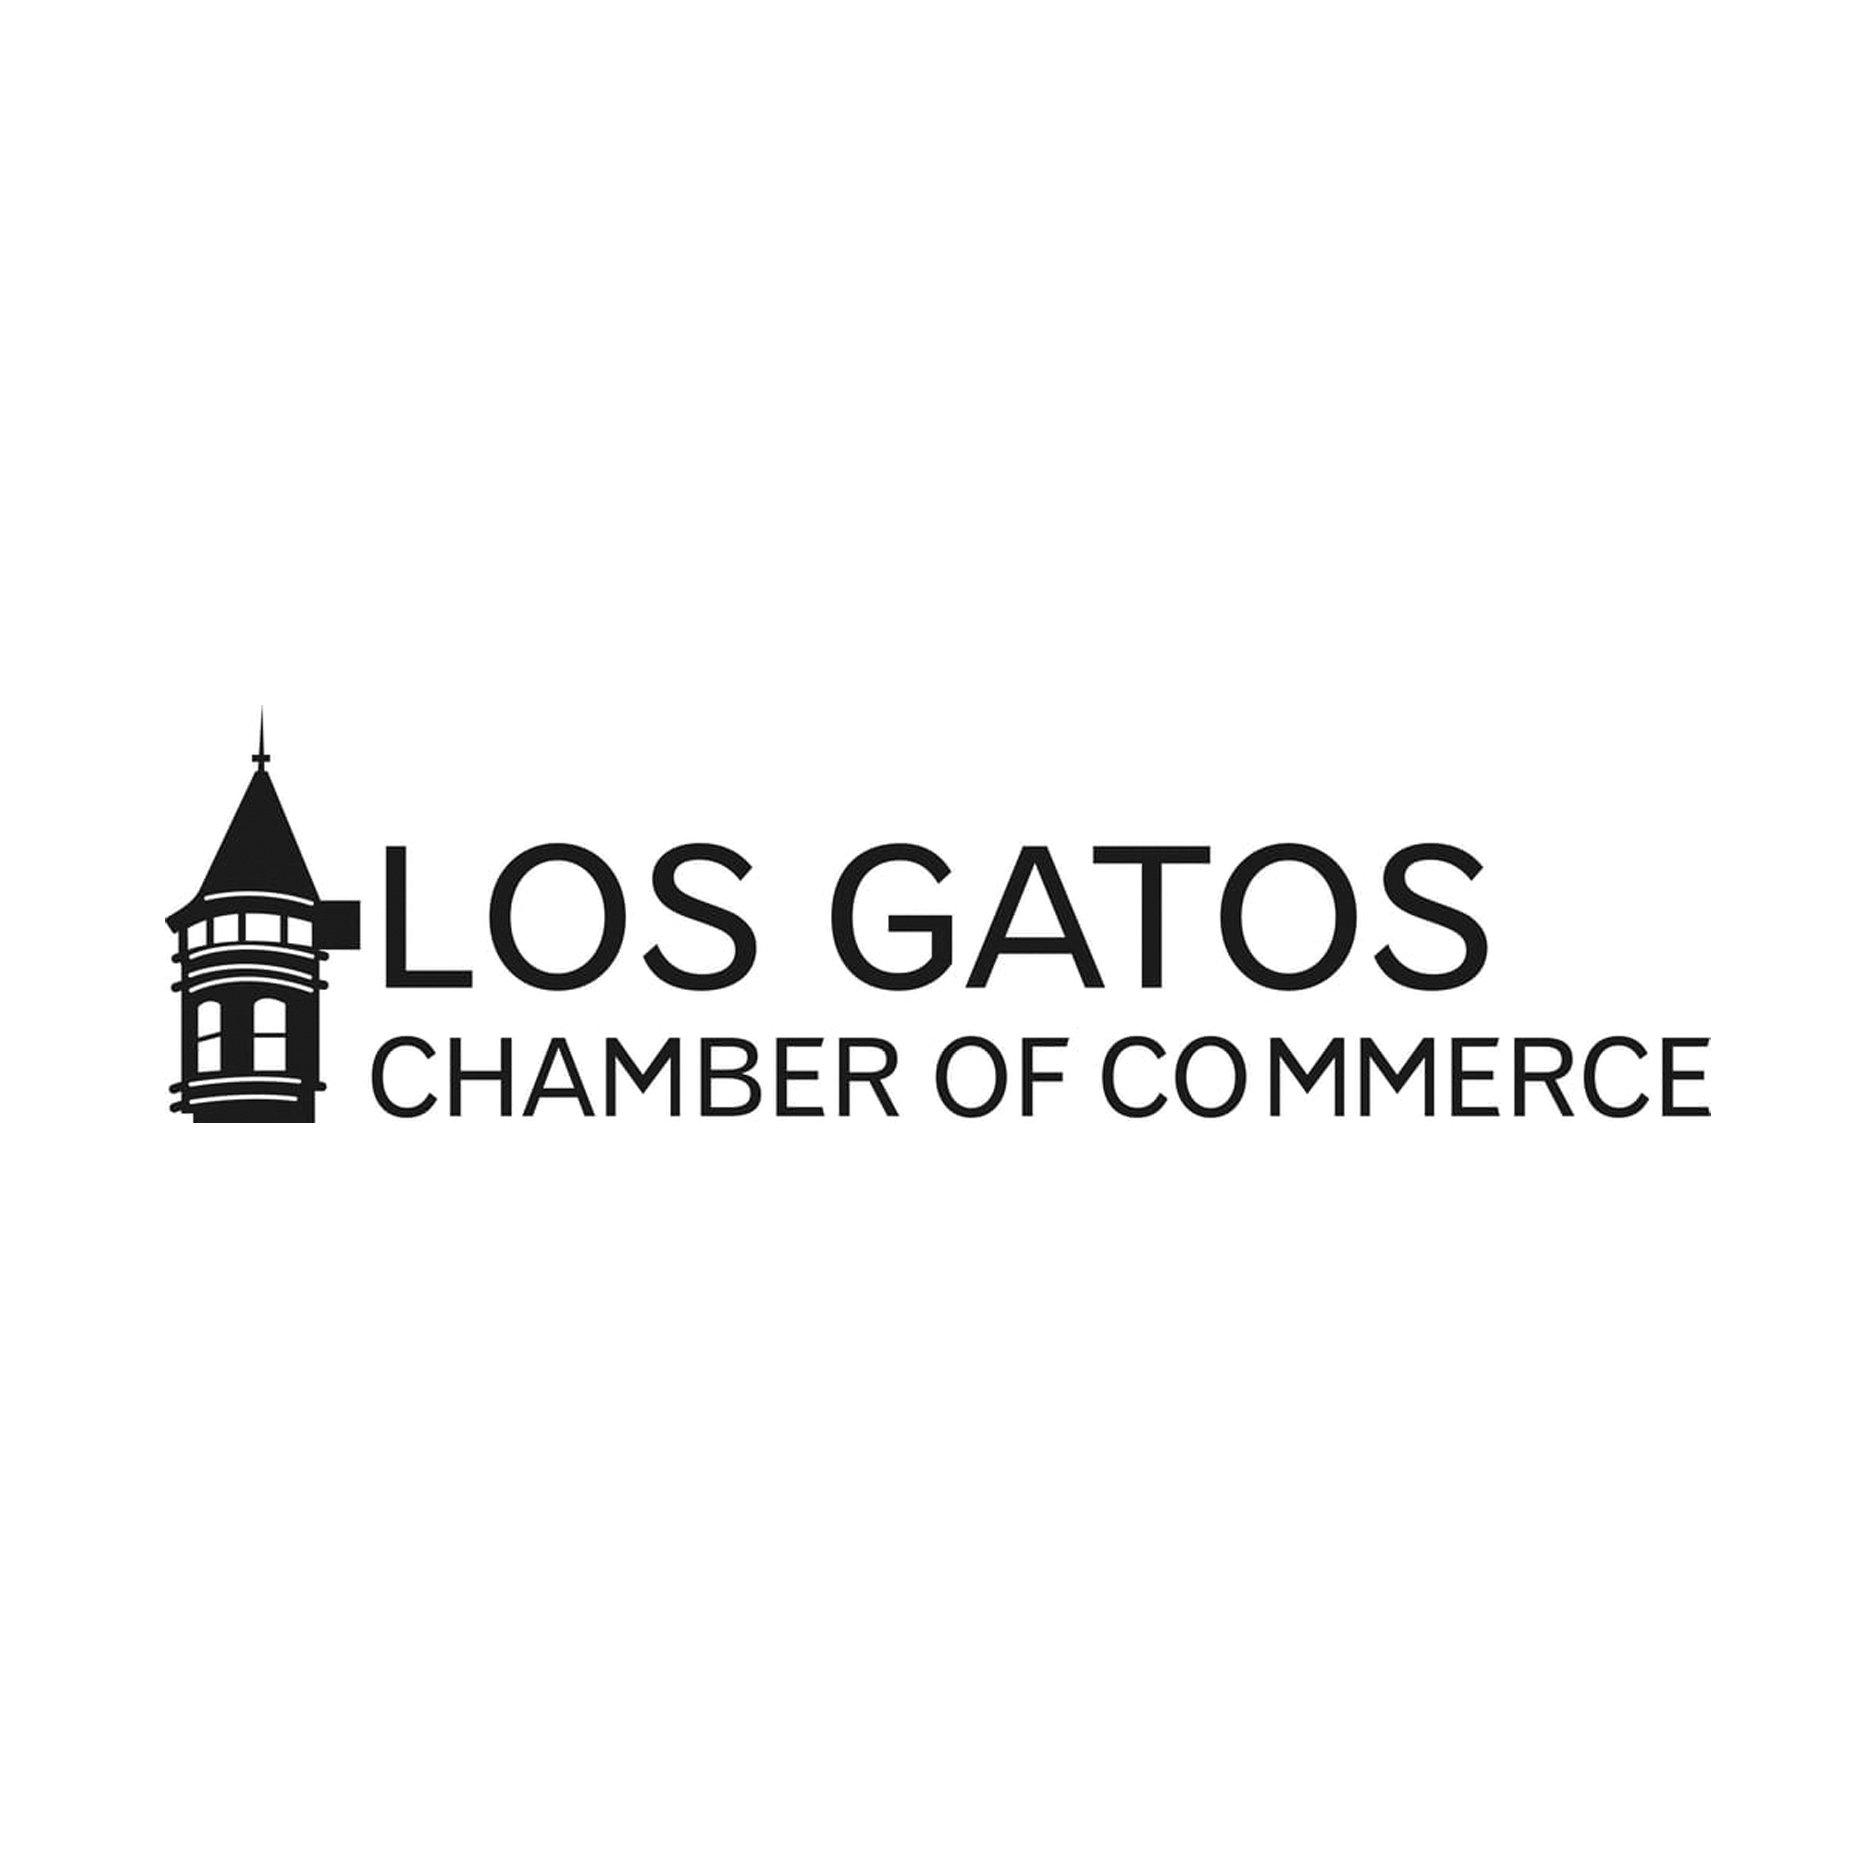 Los-Gatos-Chamber-of-Commerce.jpg